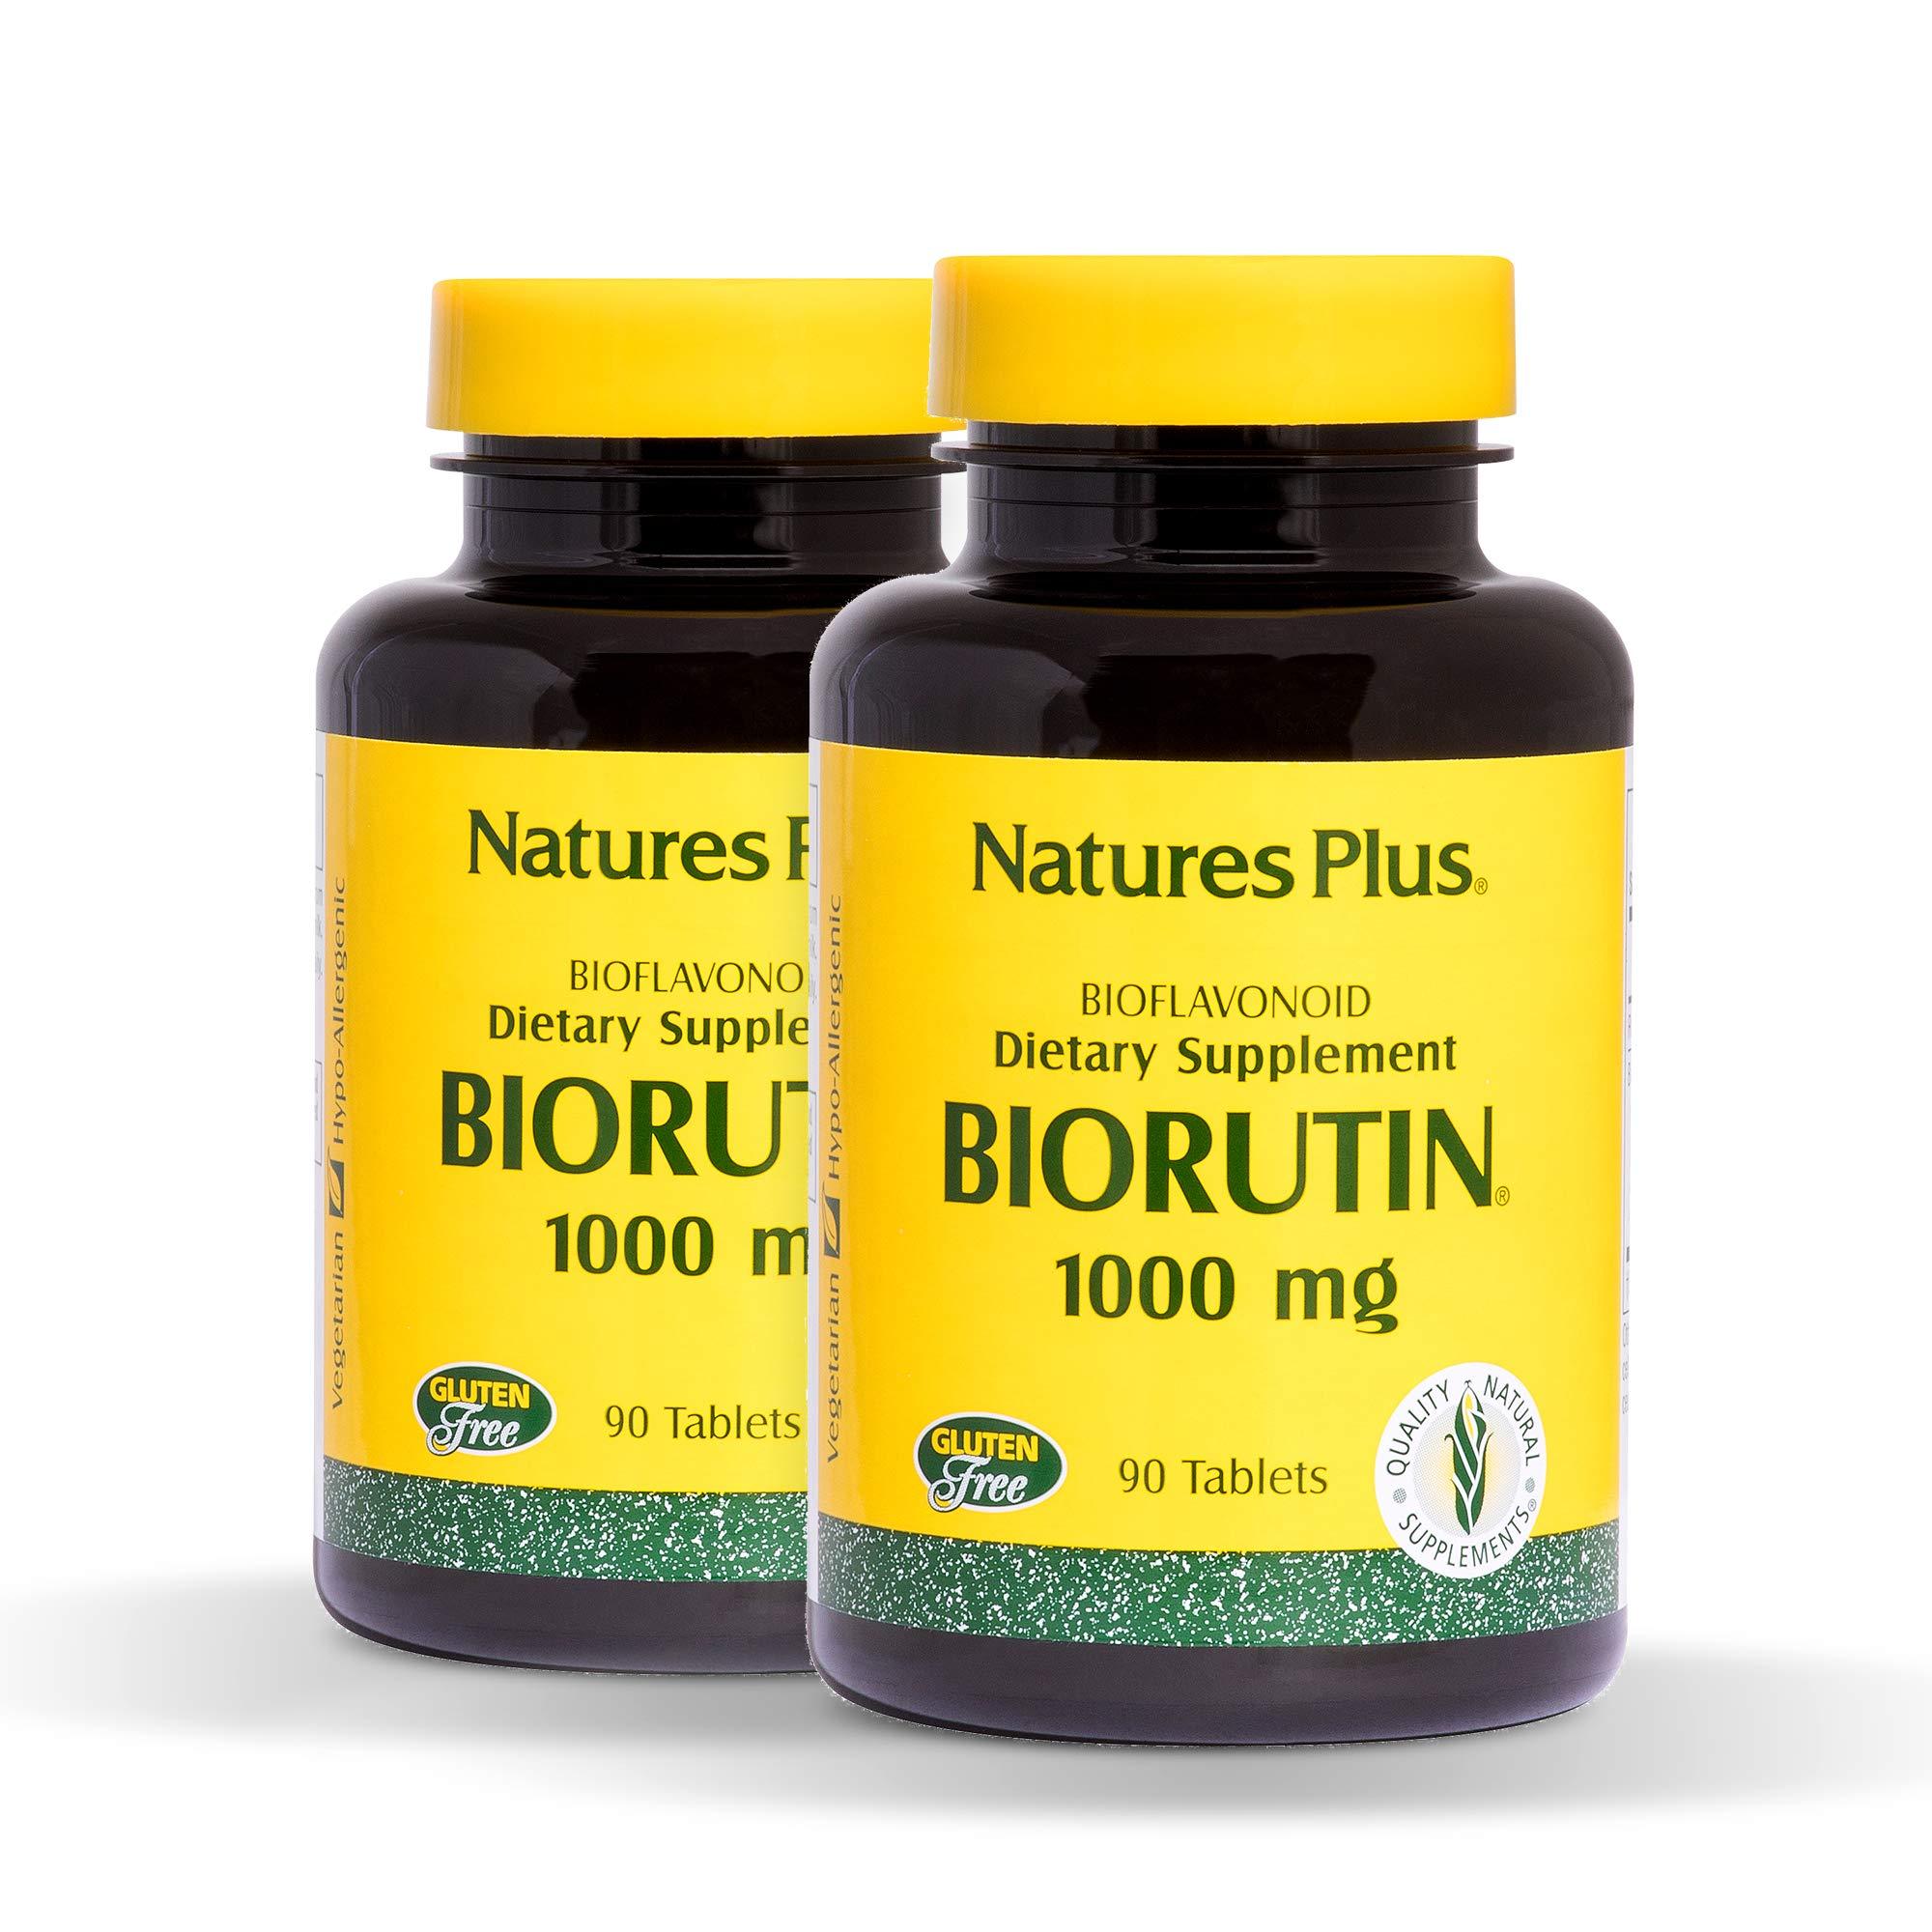 NaturesPlus Biorutin (Sophora Japonica) (2 Pack) - 1000 mg, 90 Vegetarian Tablets - Vein Health Supplement, Joint Pain Relief, Antioxidant - Hypoallergenic, Gluten-Free - 180 Total Servings